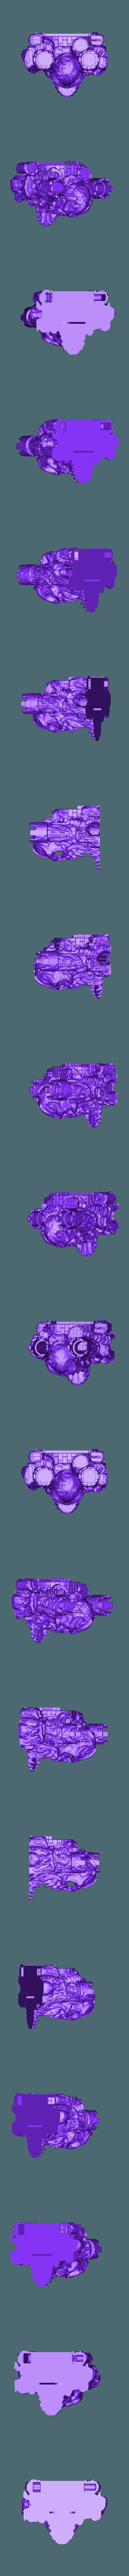 Skull-Castle_lego_v03.stl Download free STL file Gate to the Underworld (Lego compatible) • 3D printable model, edge